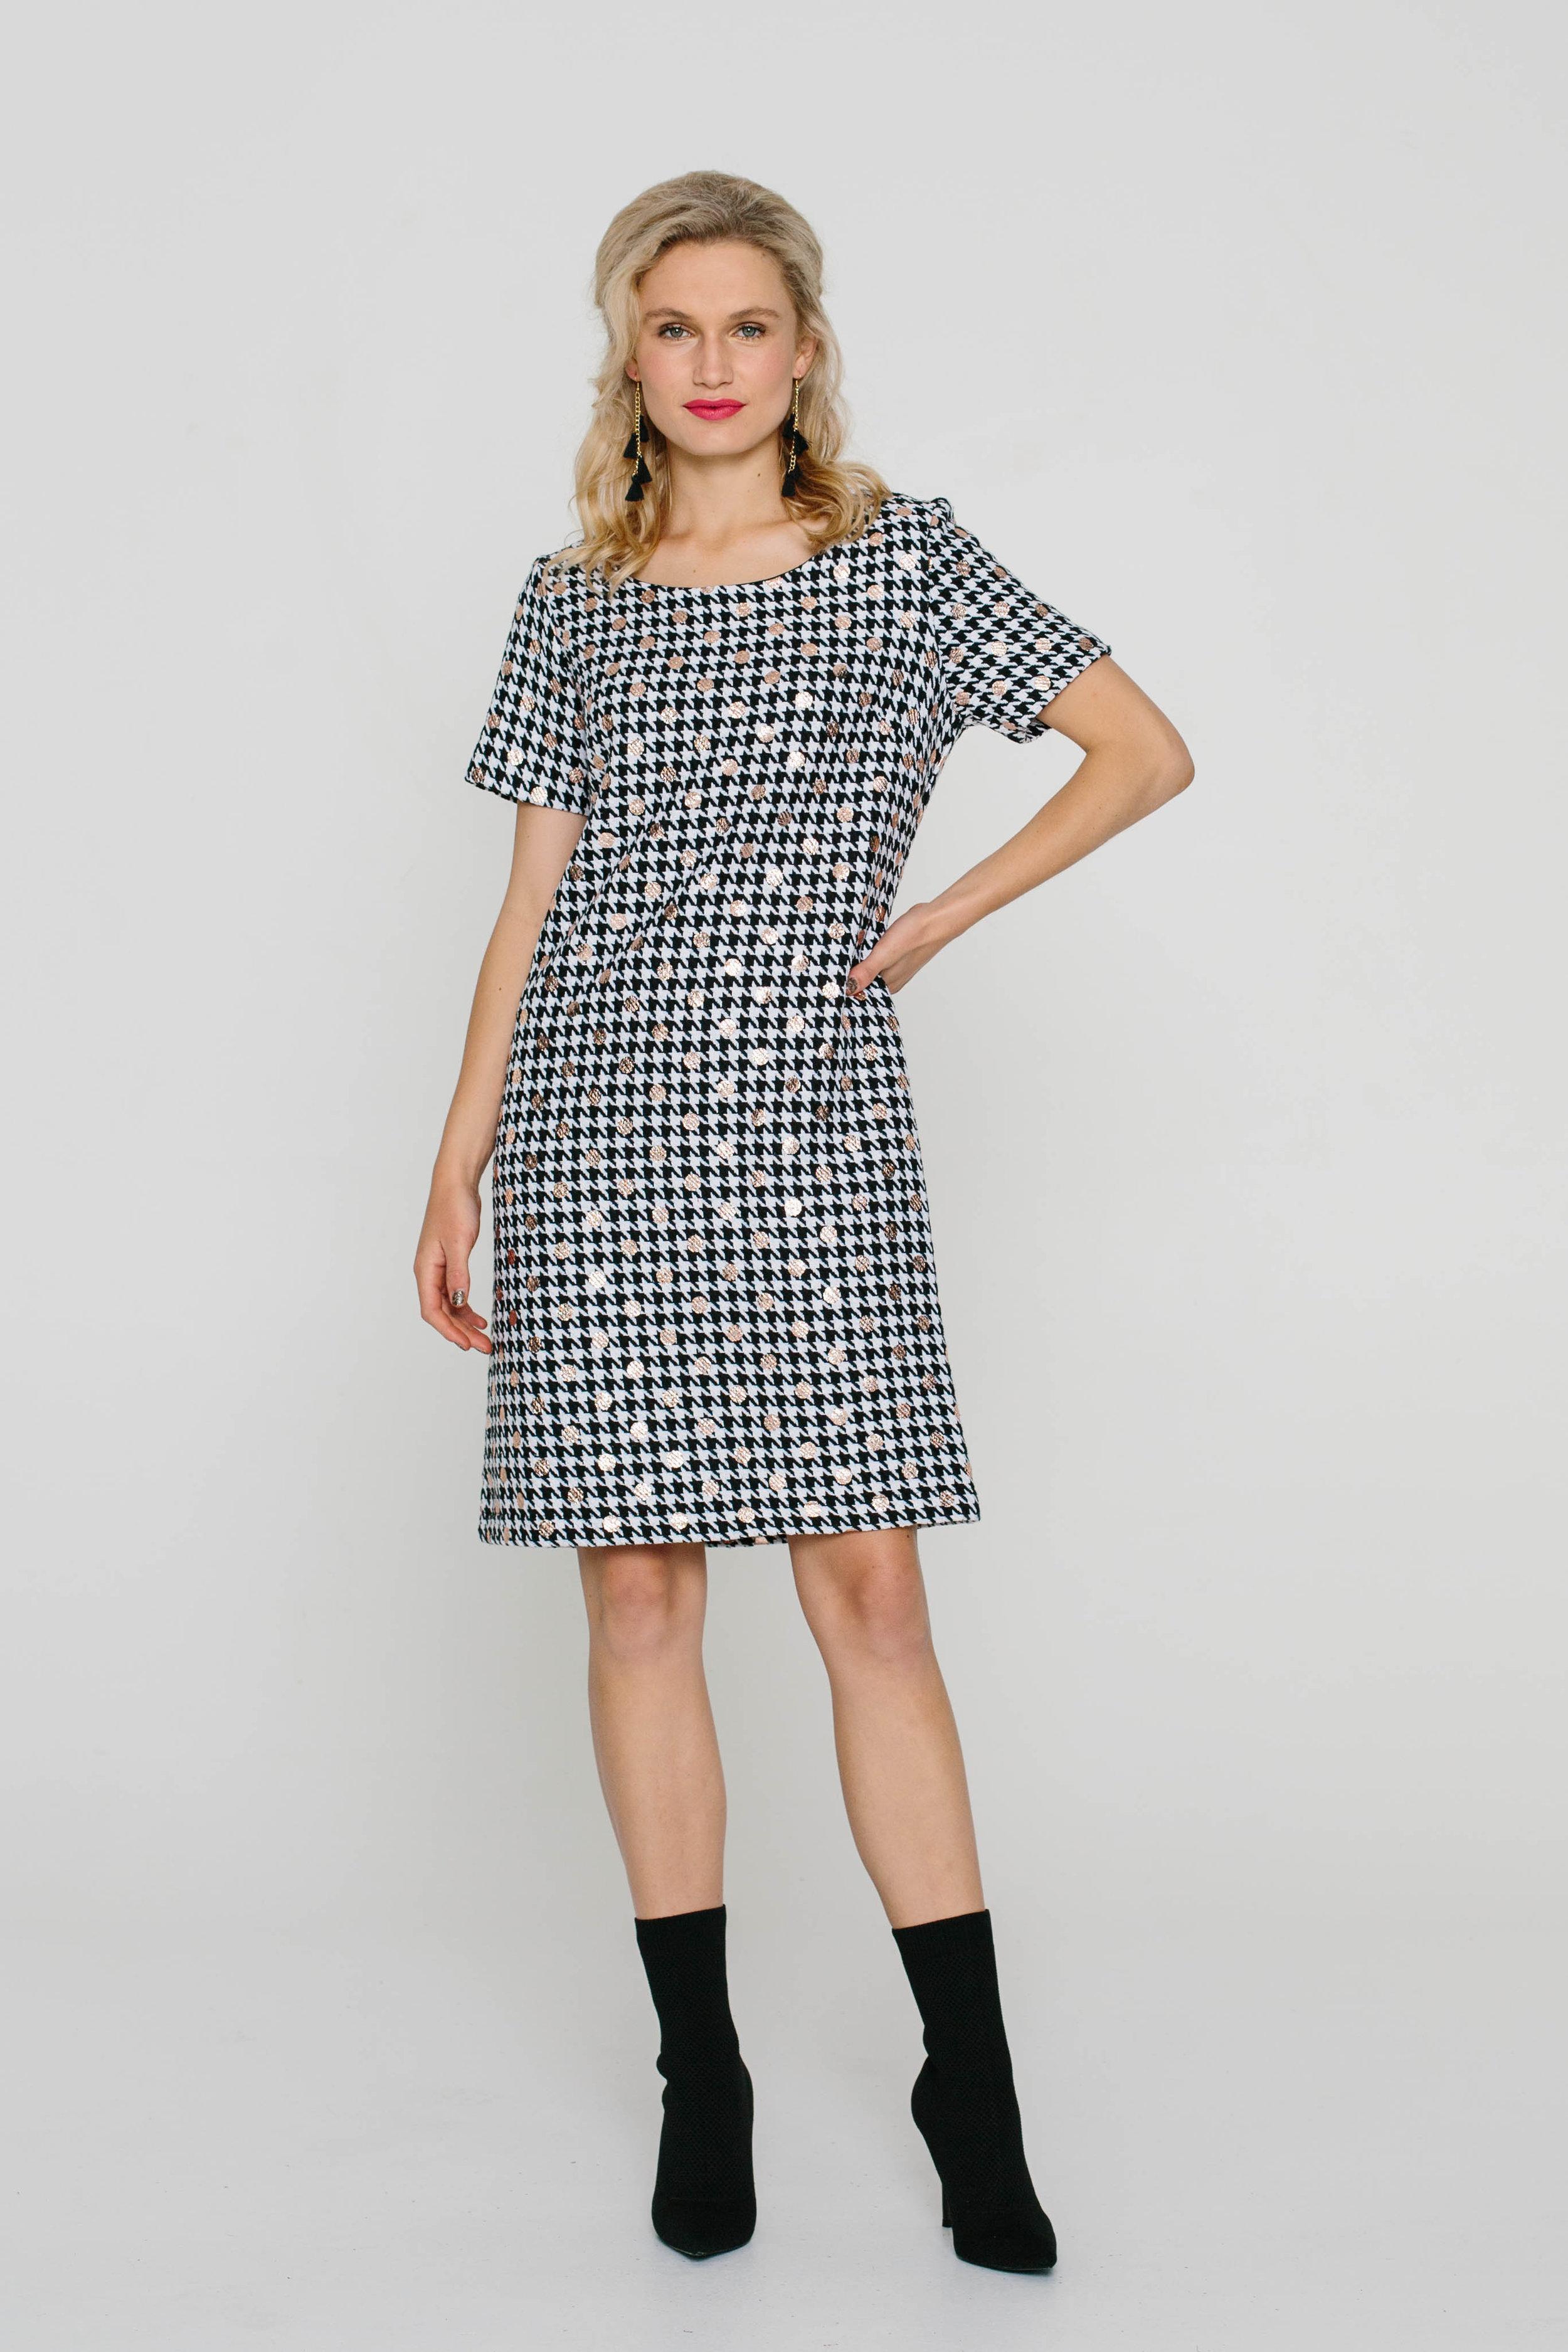 5736W Liberty Dress Chanel Rose Gold